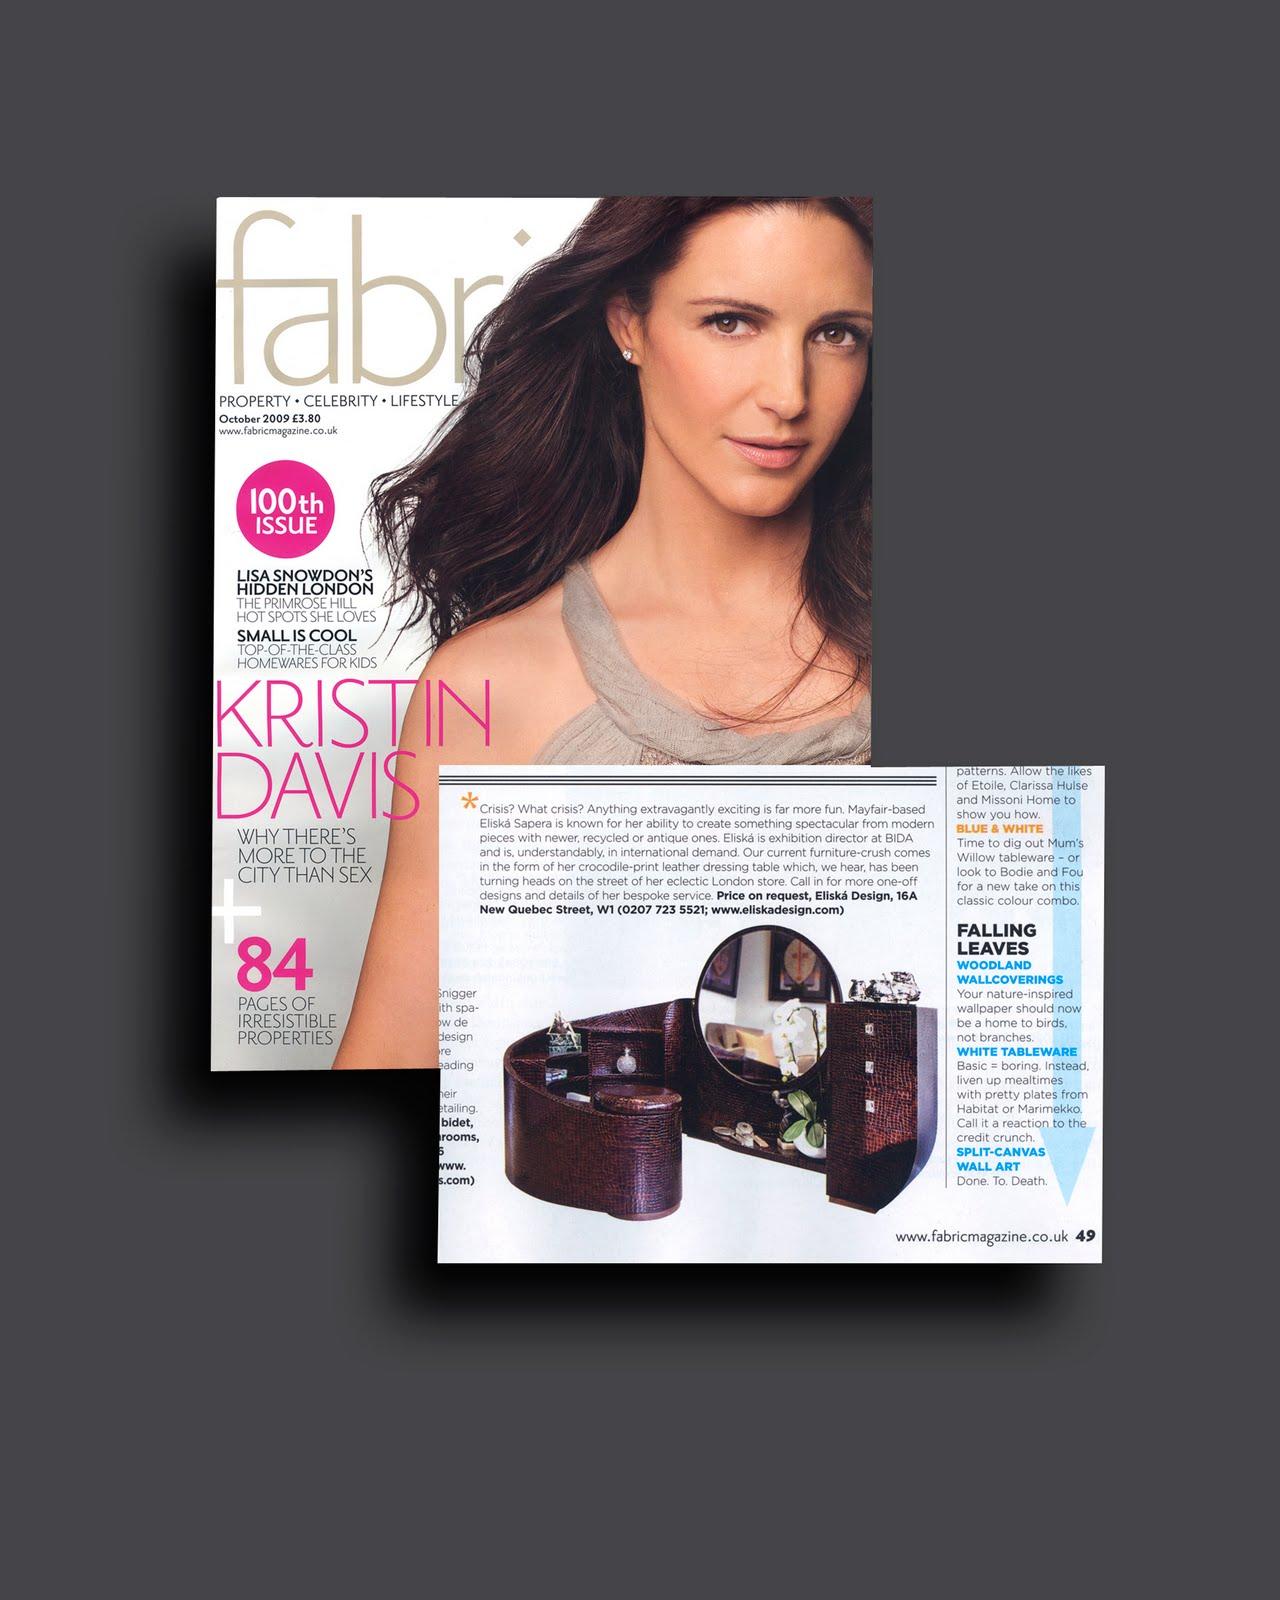 Fabric Magazine October 2009 Fabric Magazine October 2009